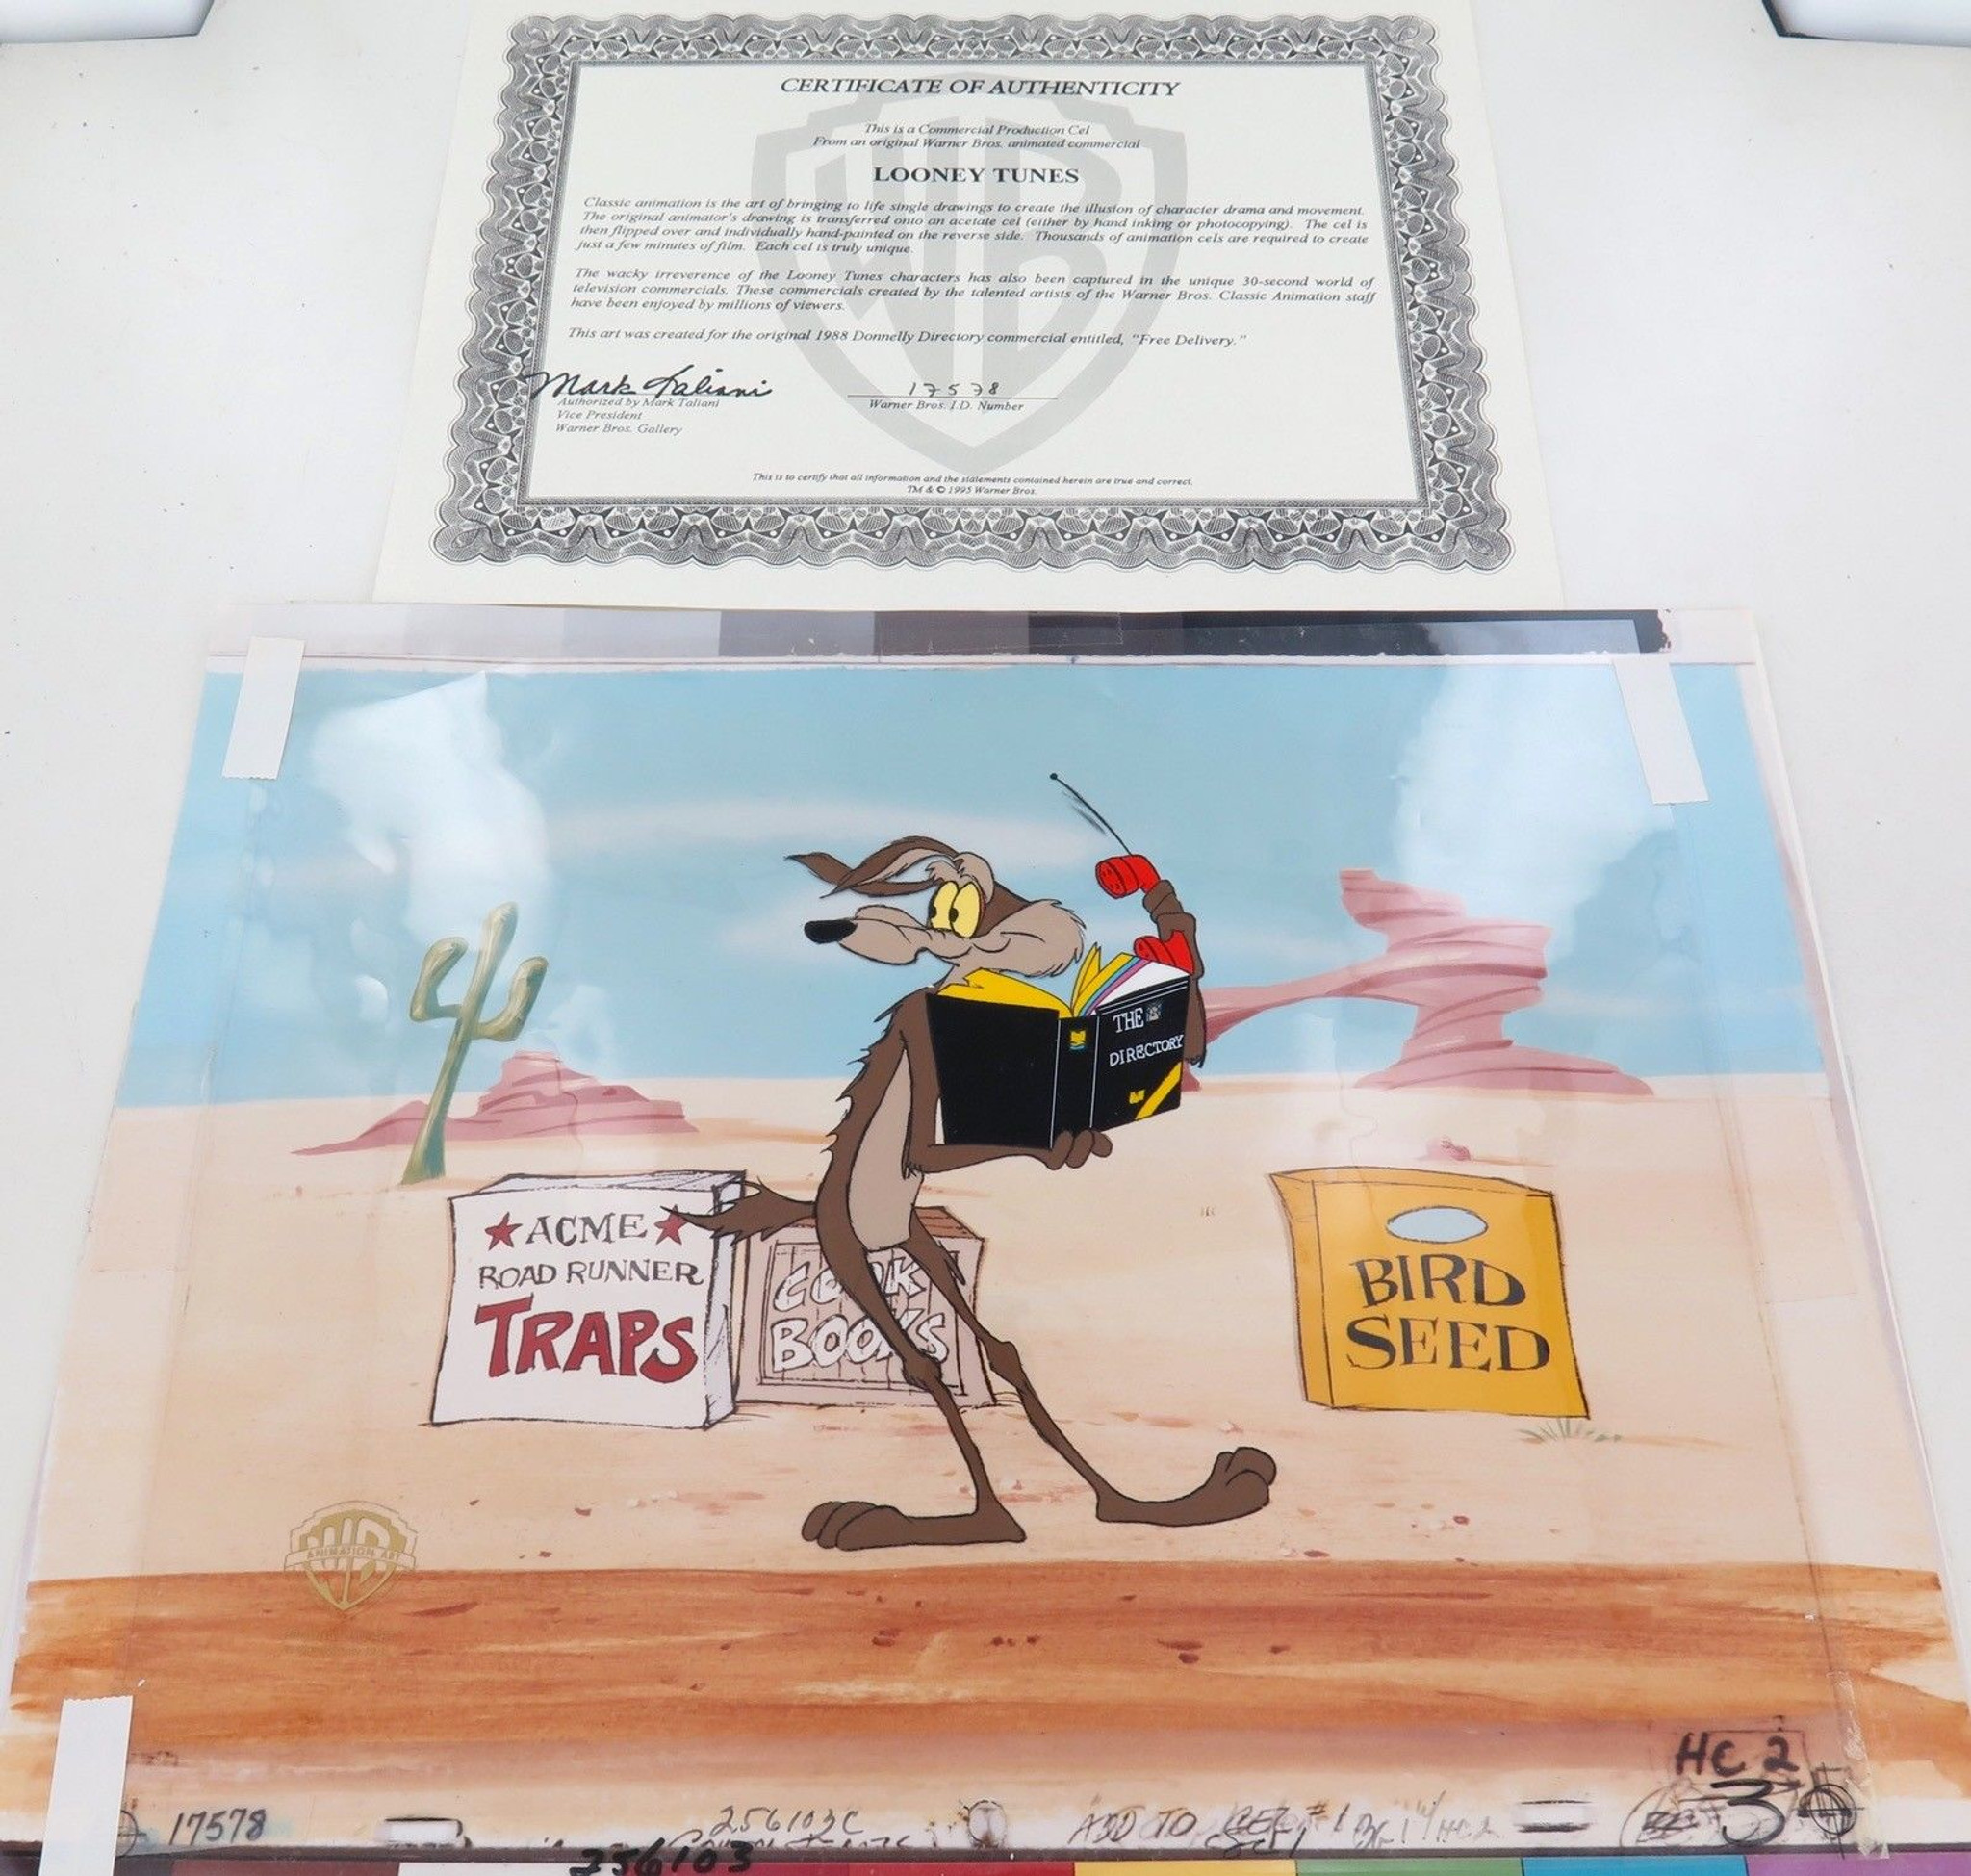 Coyote /& Rod Runner Warner Bros Hand Drawn /& Hand Painted Cel Looney Tunes